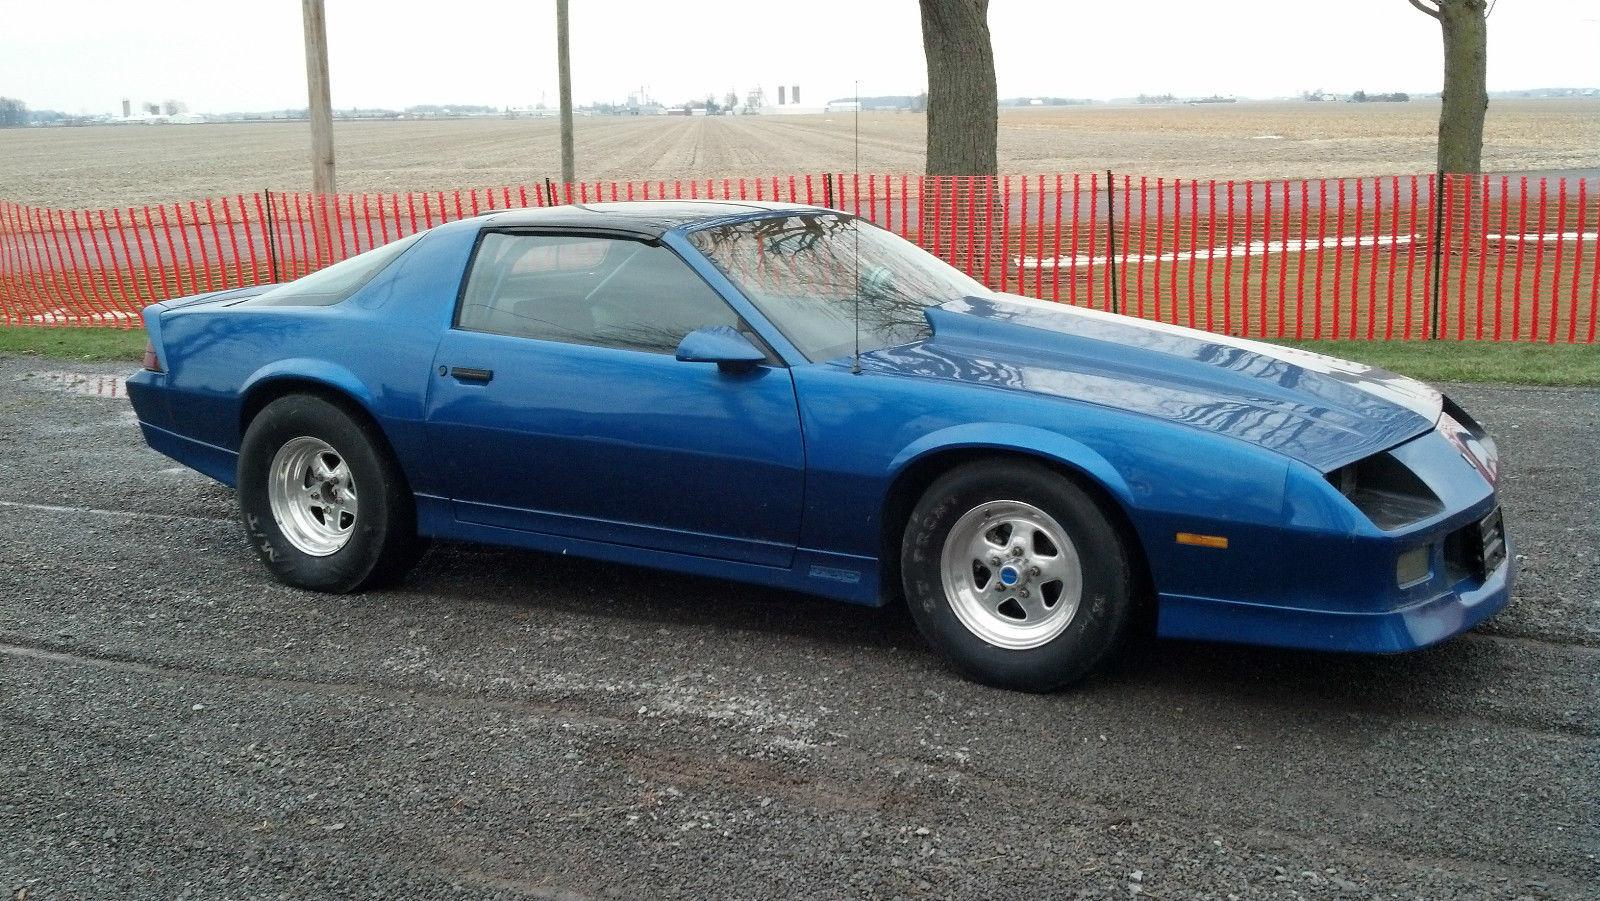 1986 CAMARO DRAG CAR, STREET CAR - Classic Chevrolet ...